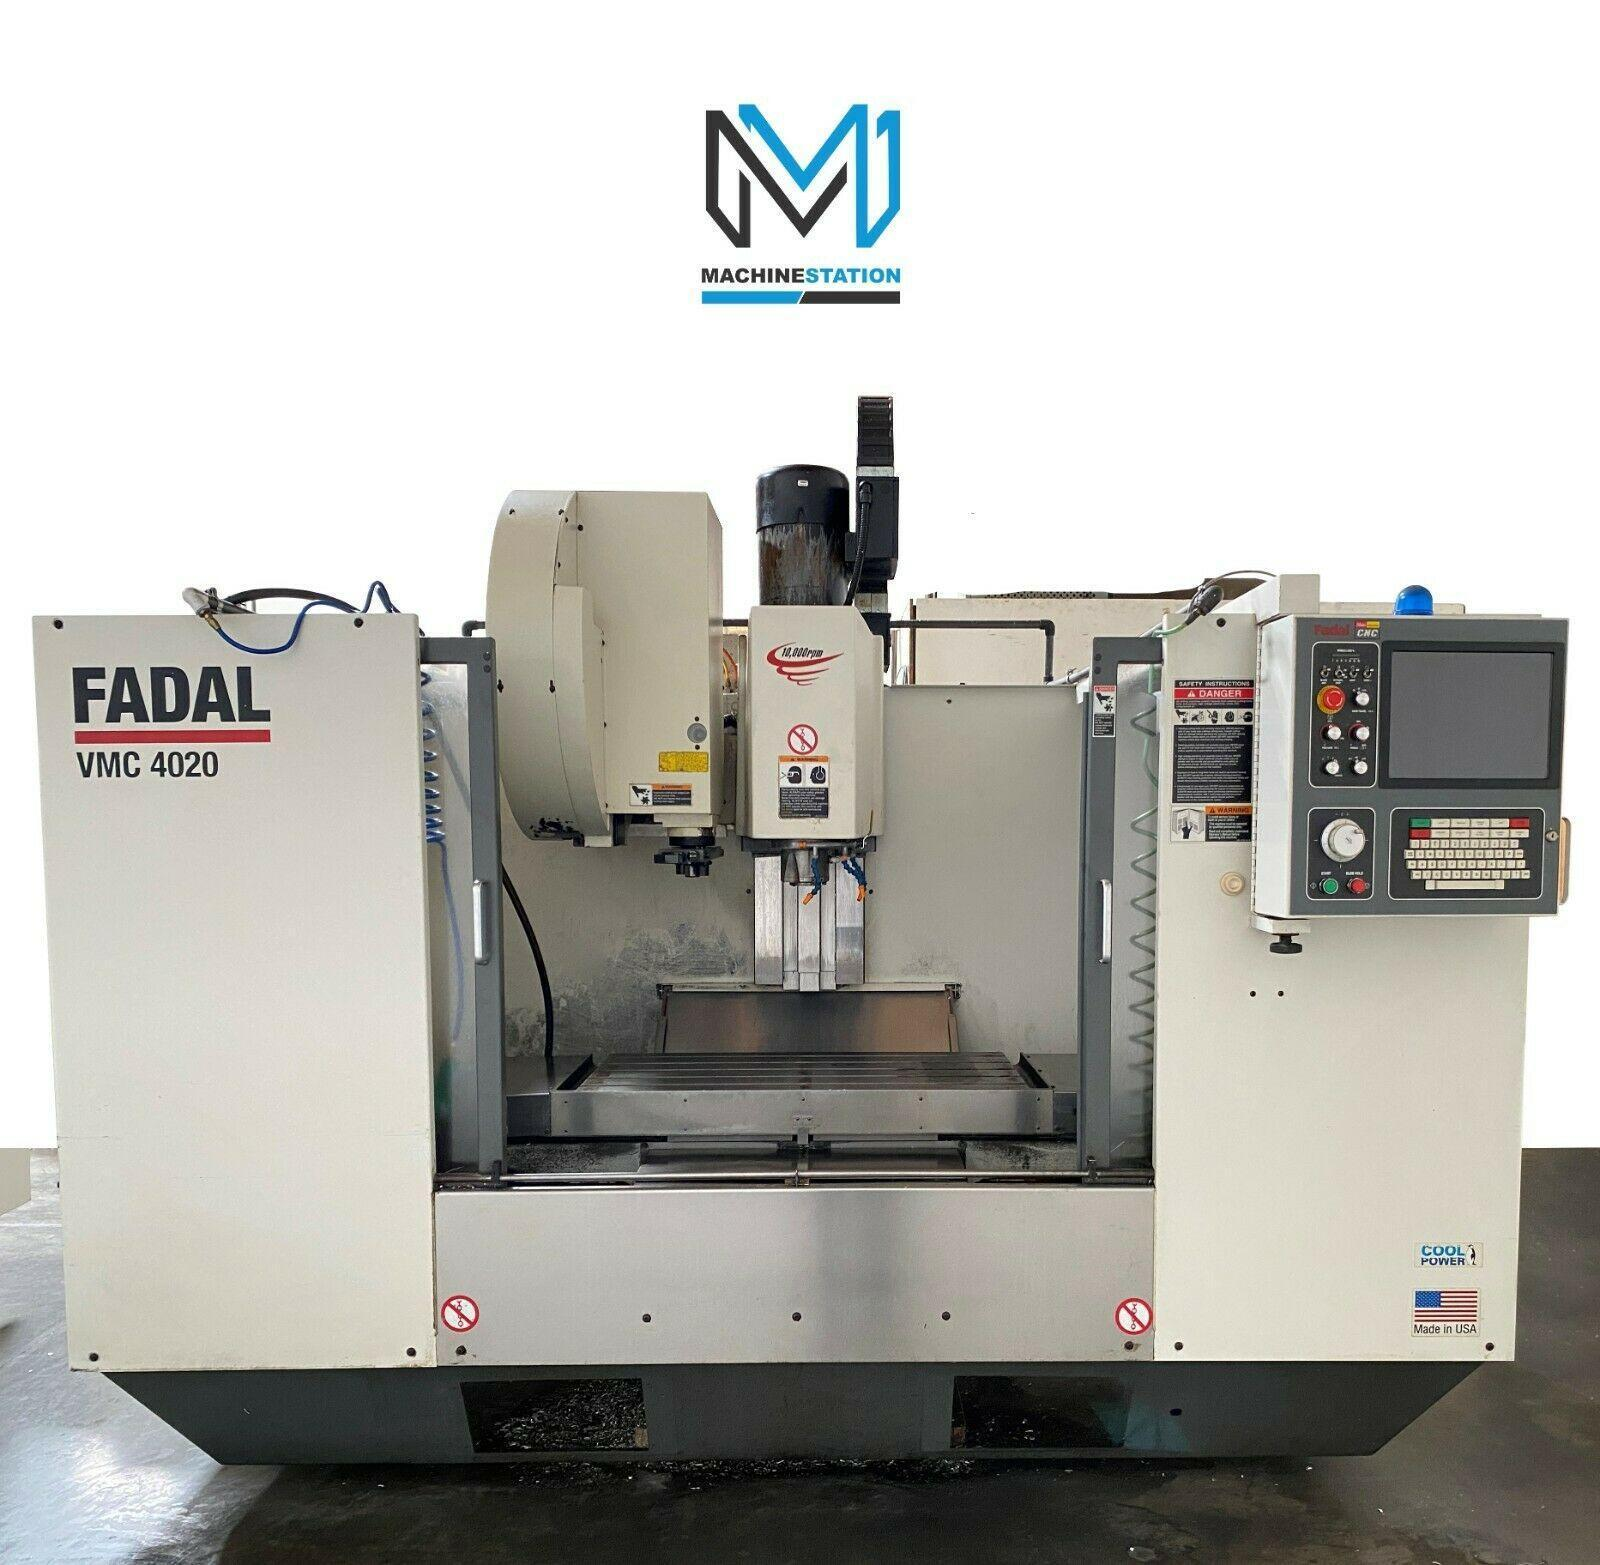 FADAL VMC 4020 CNC VERTICAL MACHINING CENTER